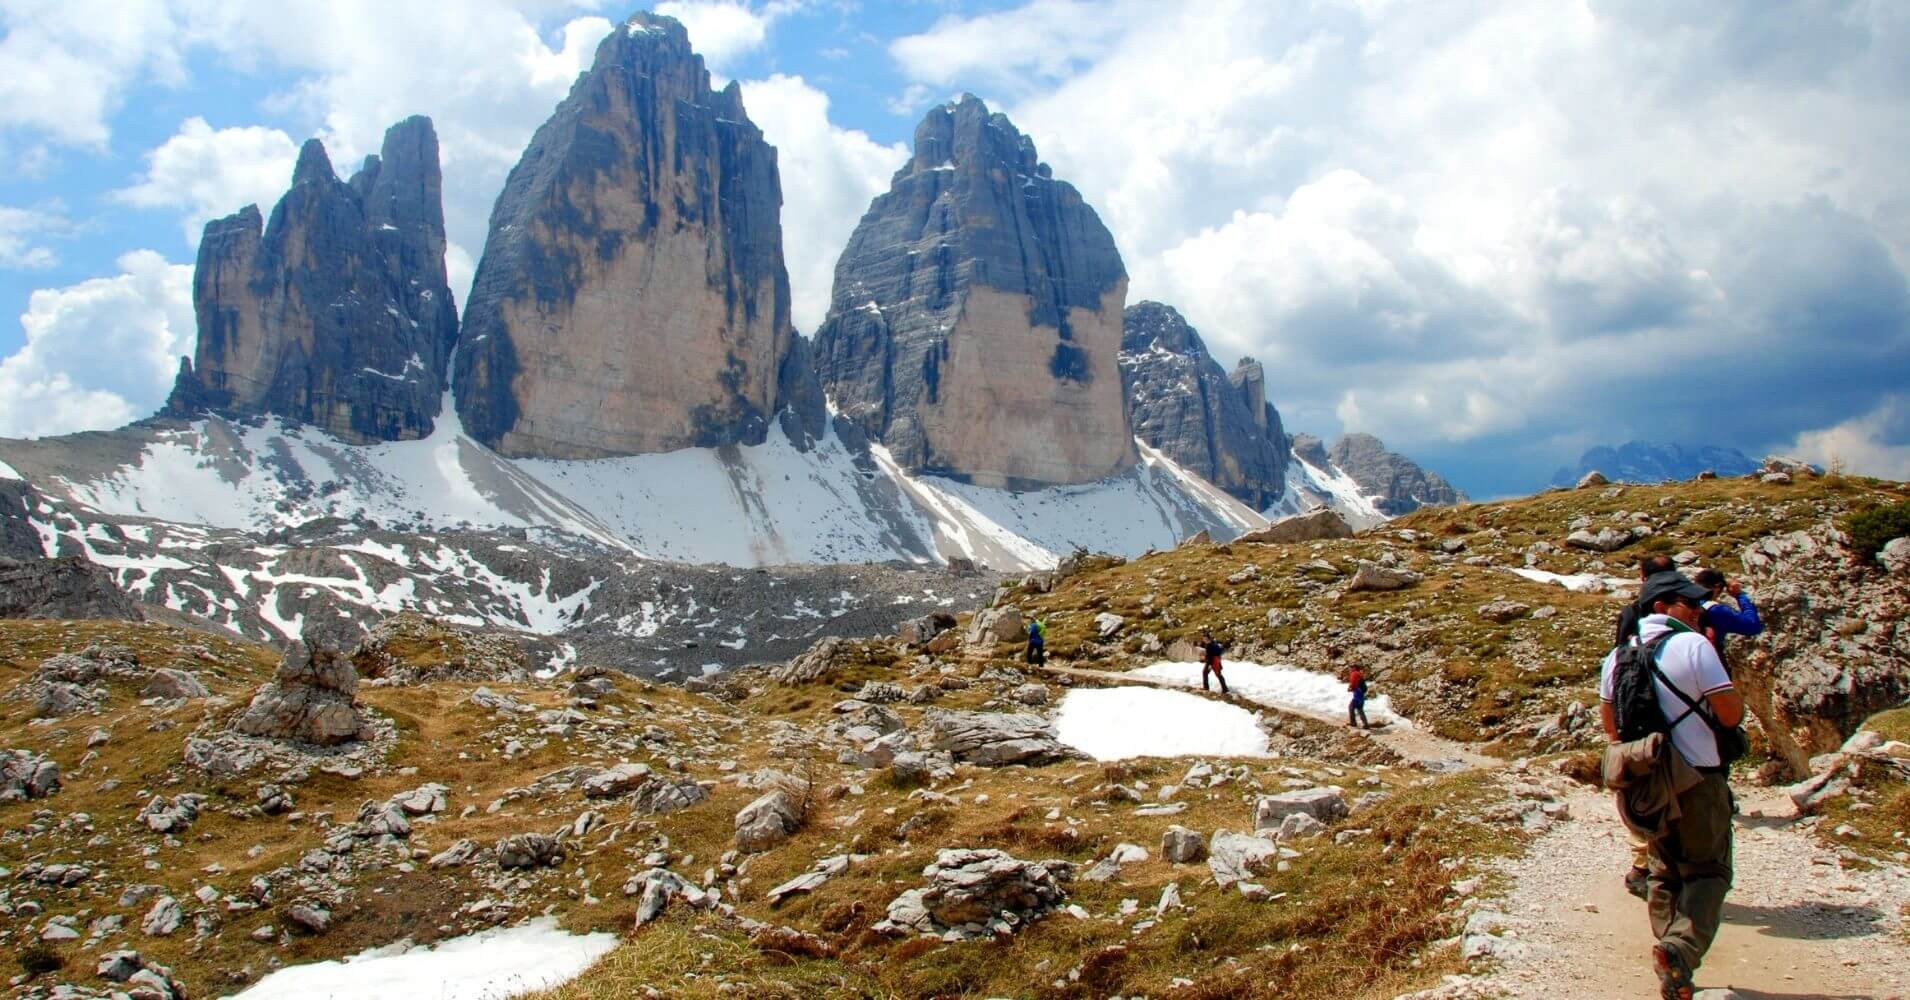 Vuelta a las Tres Cimas de Lavaredo. Alpes Dolomitas, Belluno. Véneto. Italia.